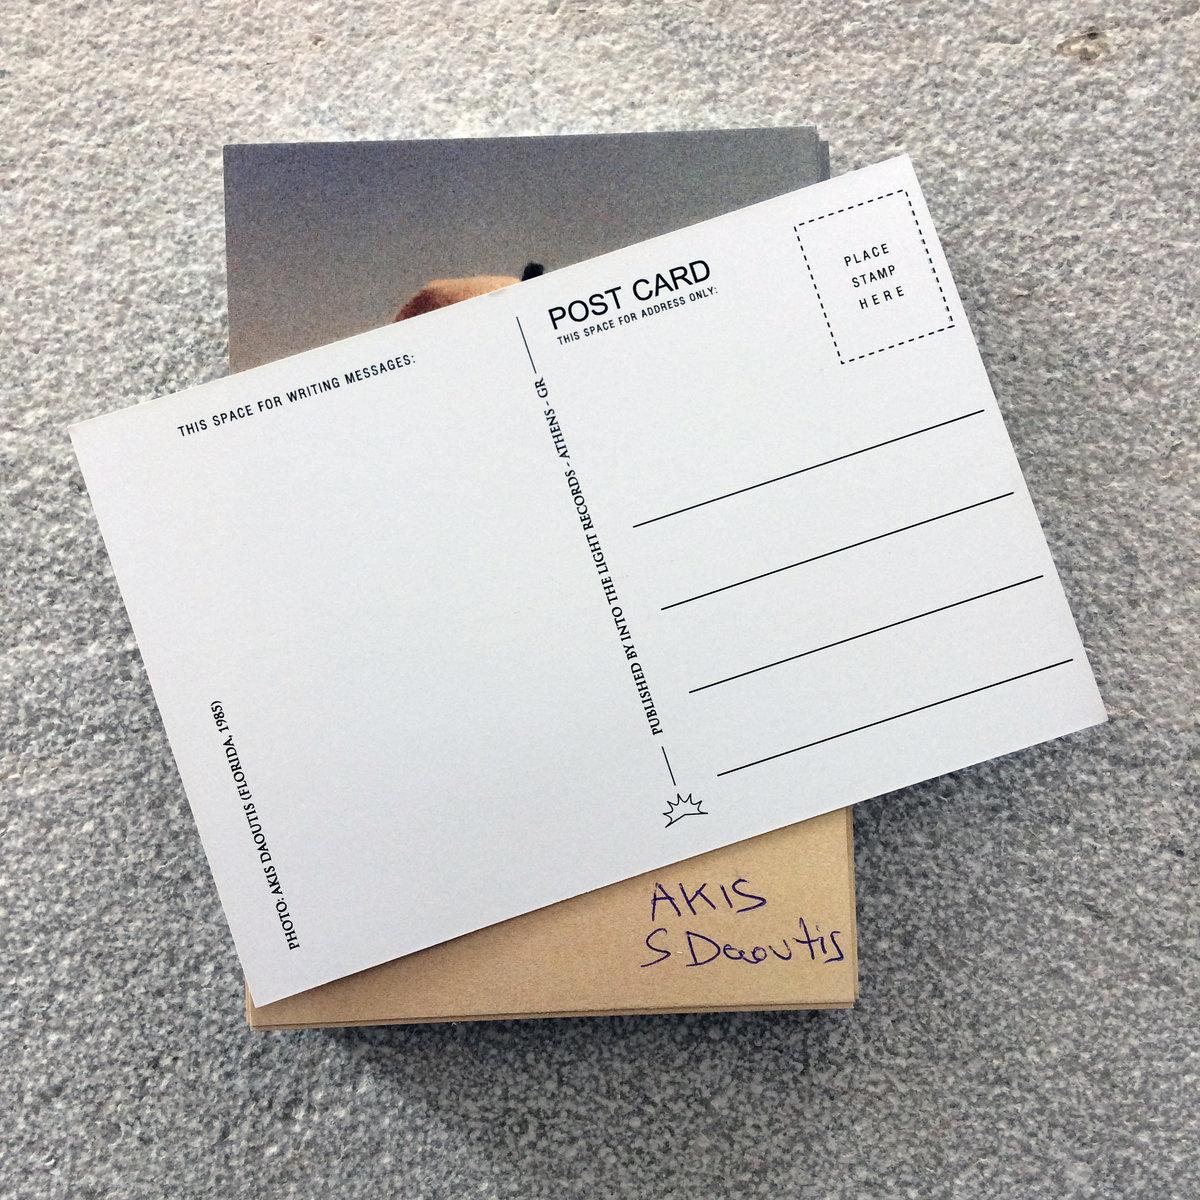 AKIS CARD WINDOWS 7 DRIVERS DOWNLOAD (2019)